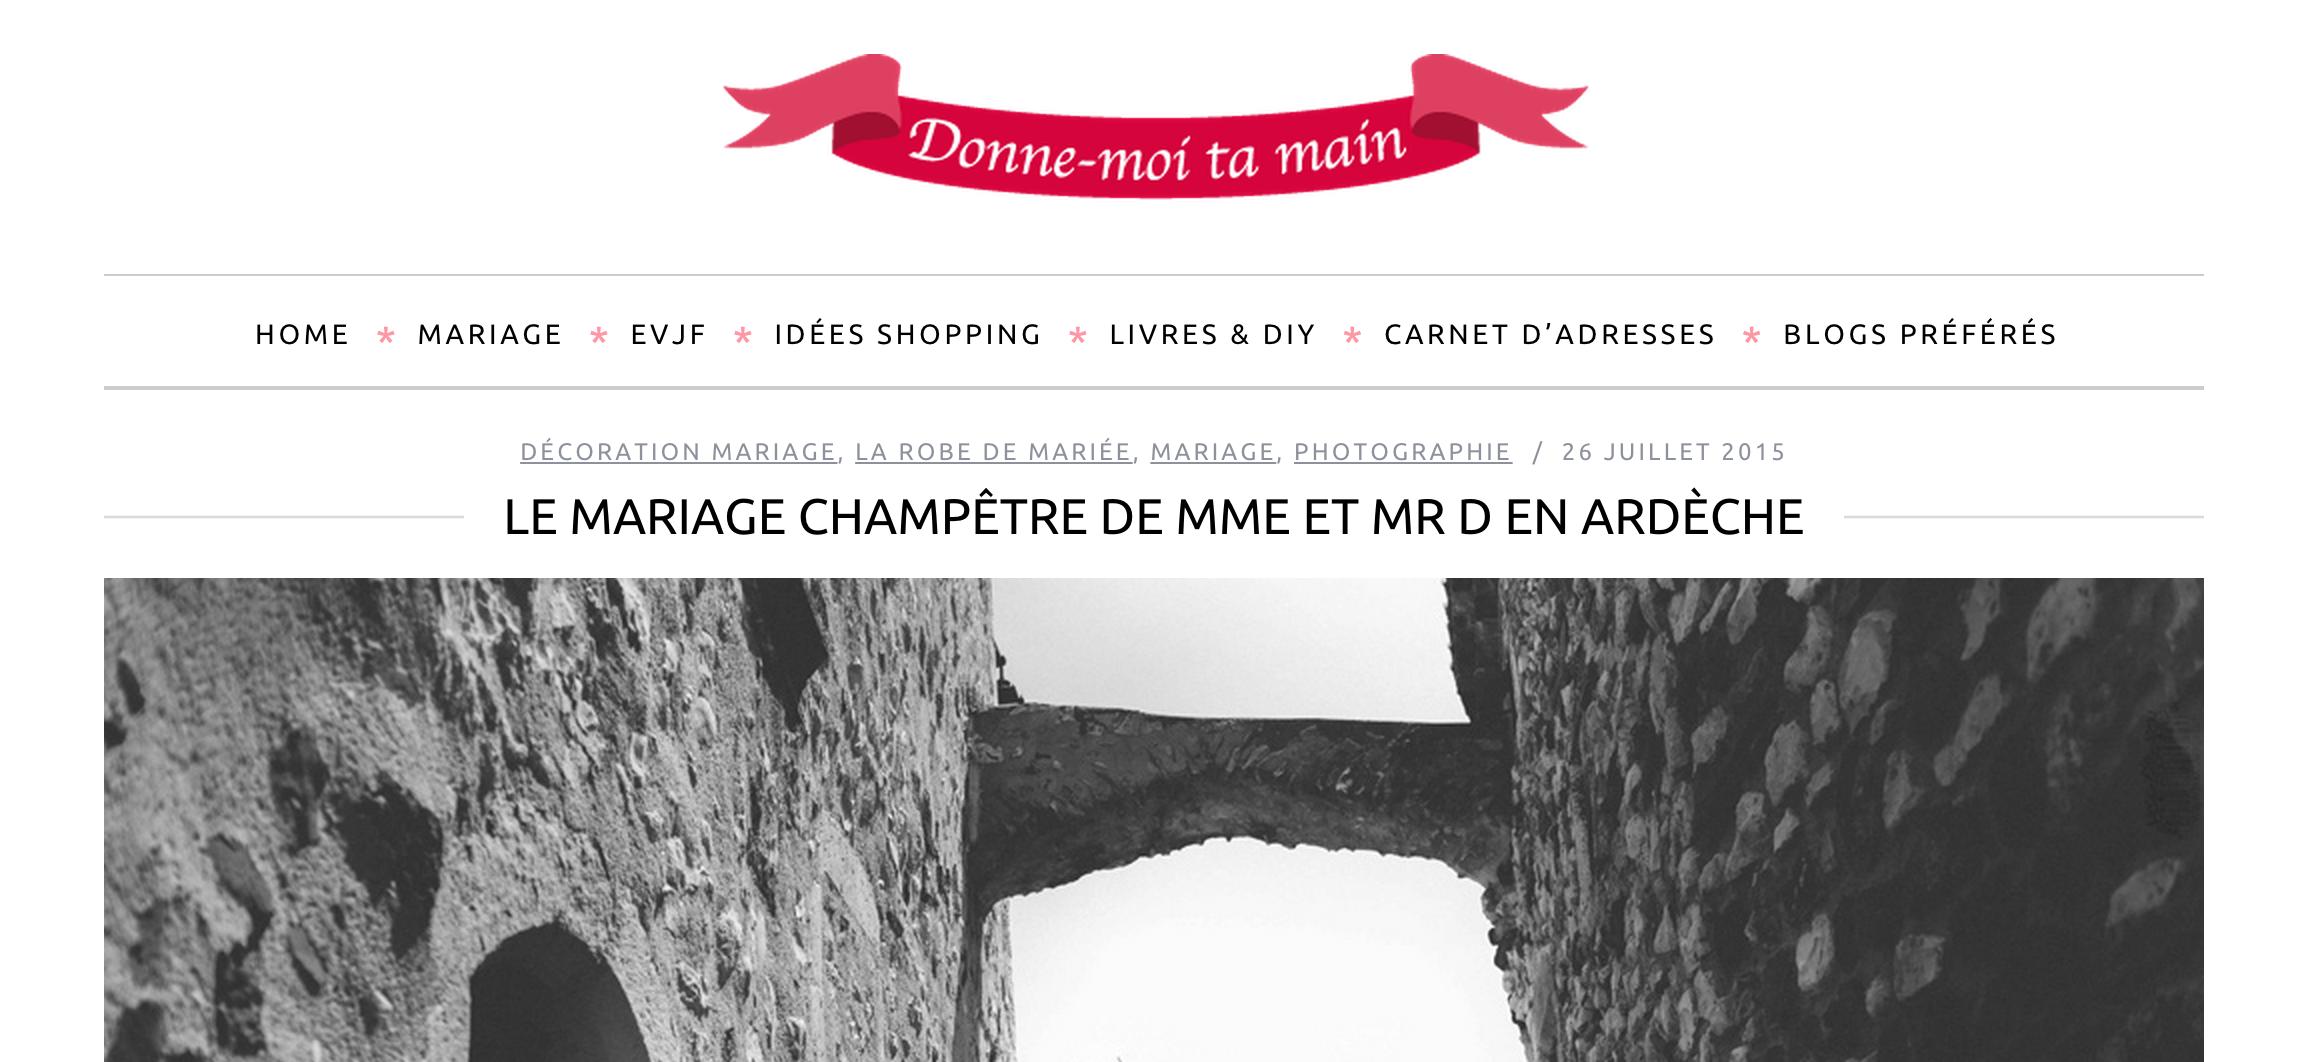 Dossier de presse - Elle - Mai 2015